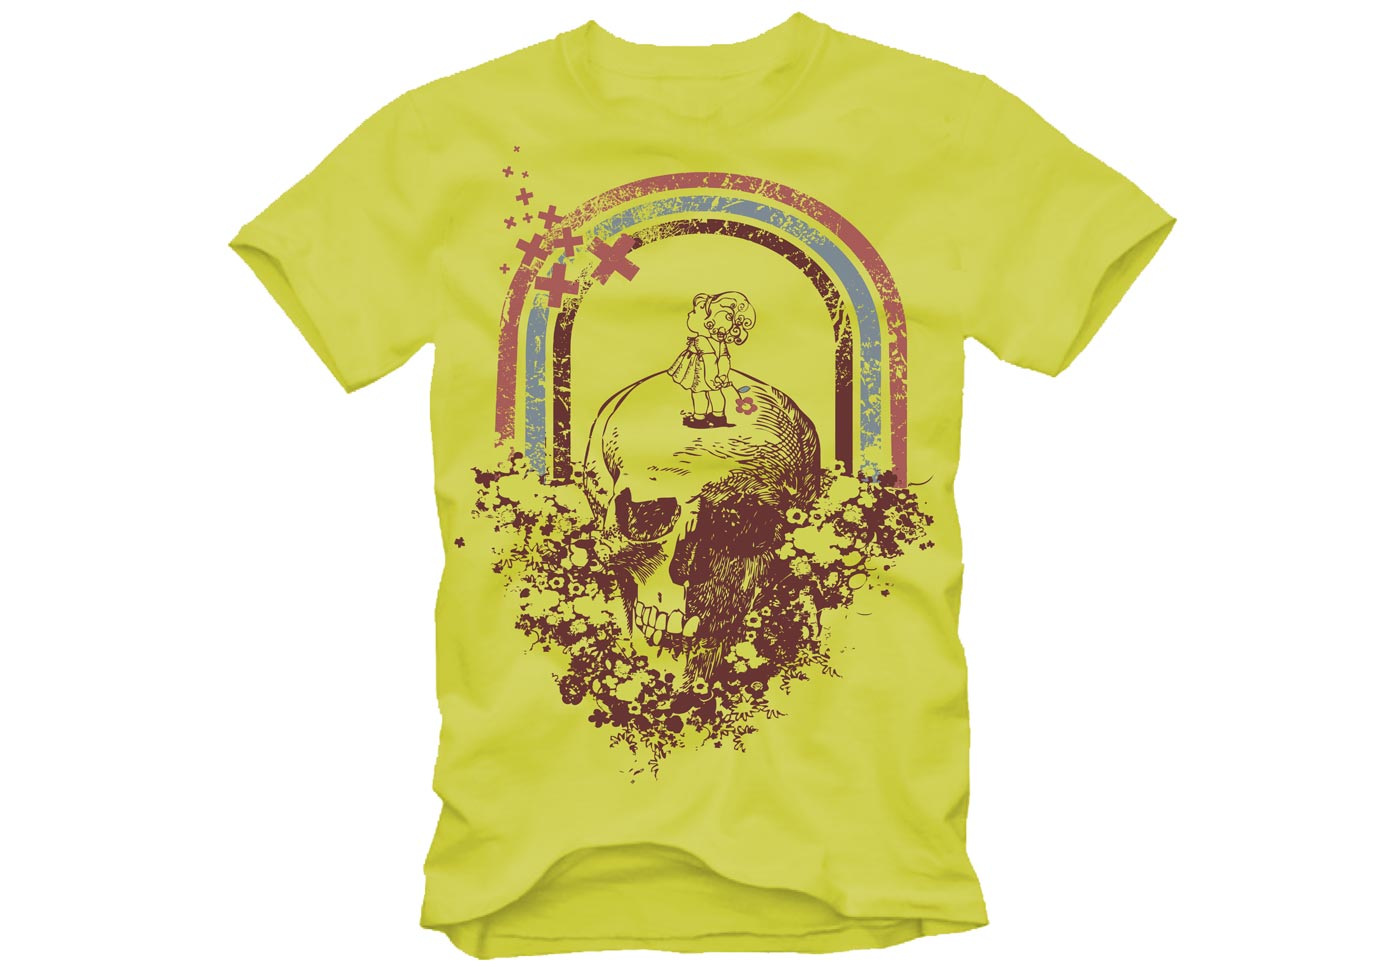 Free retro t shirt design download free vector art for T shirt design vector free